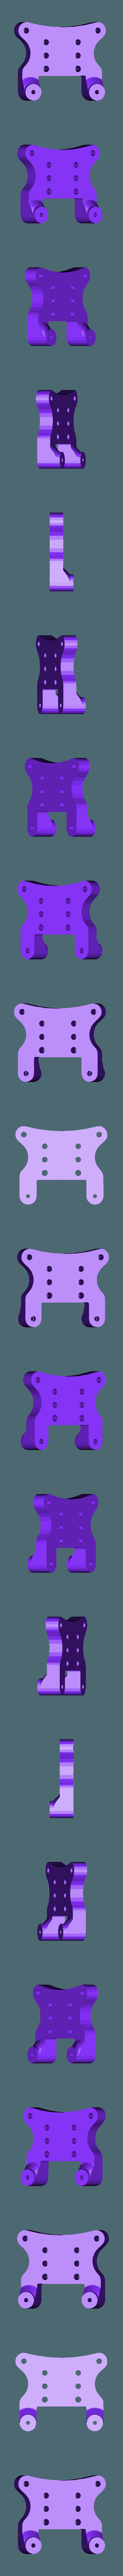 Shocks mount.STL Download free STL file 1/10 RC 4WD TRUGGY BT250.2 • 3D printer object, ivnssnn